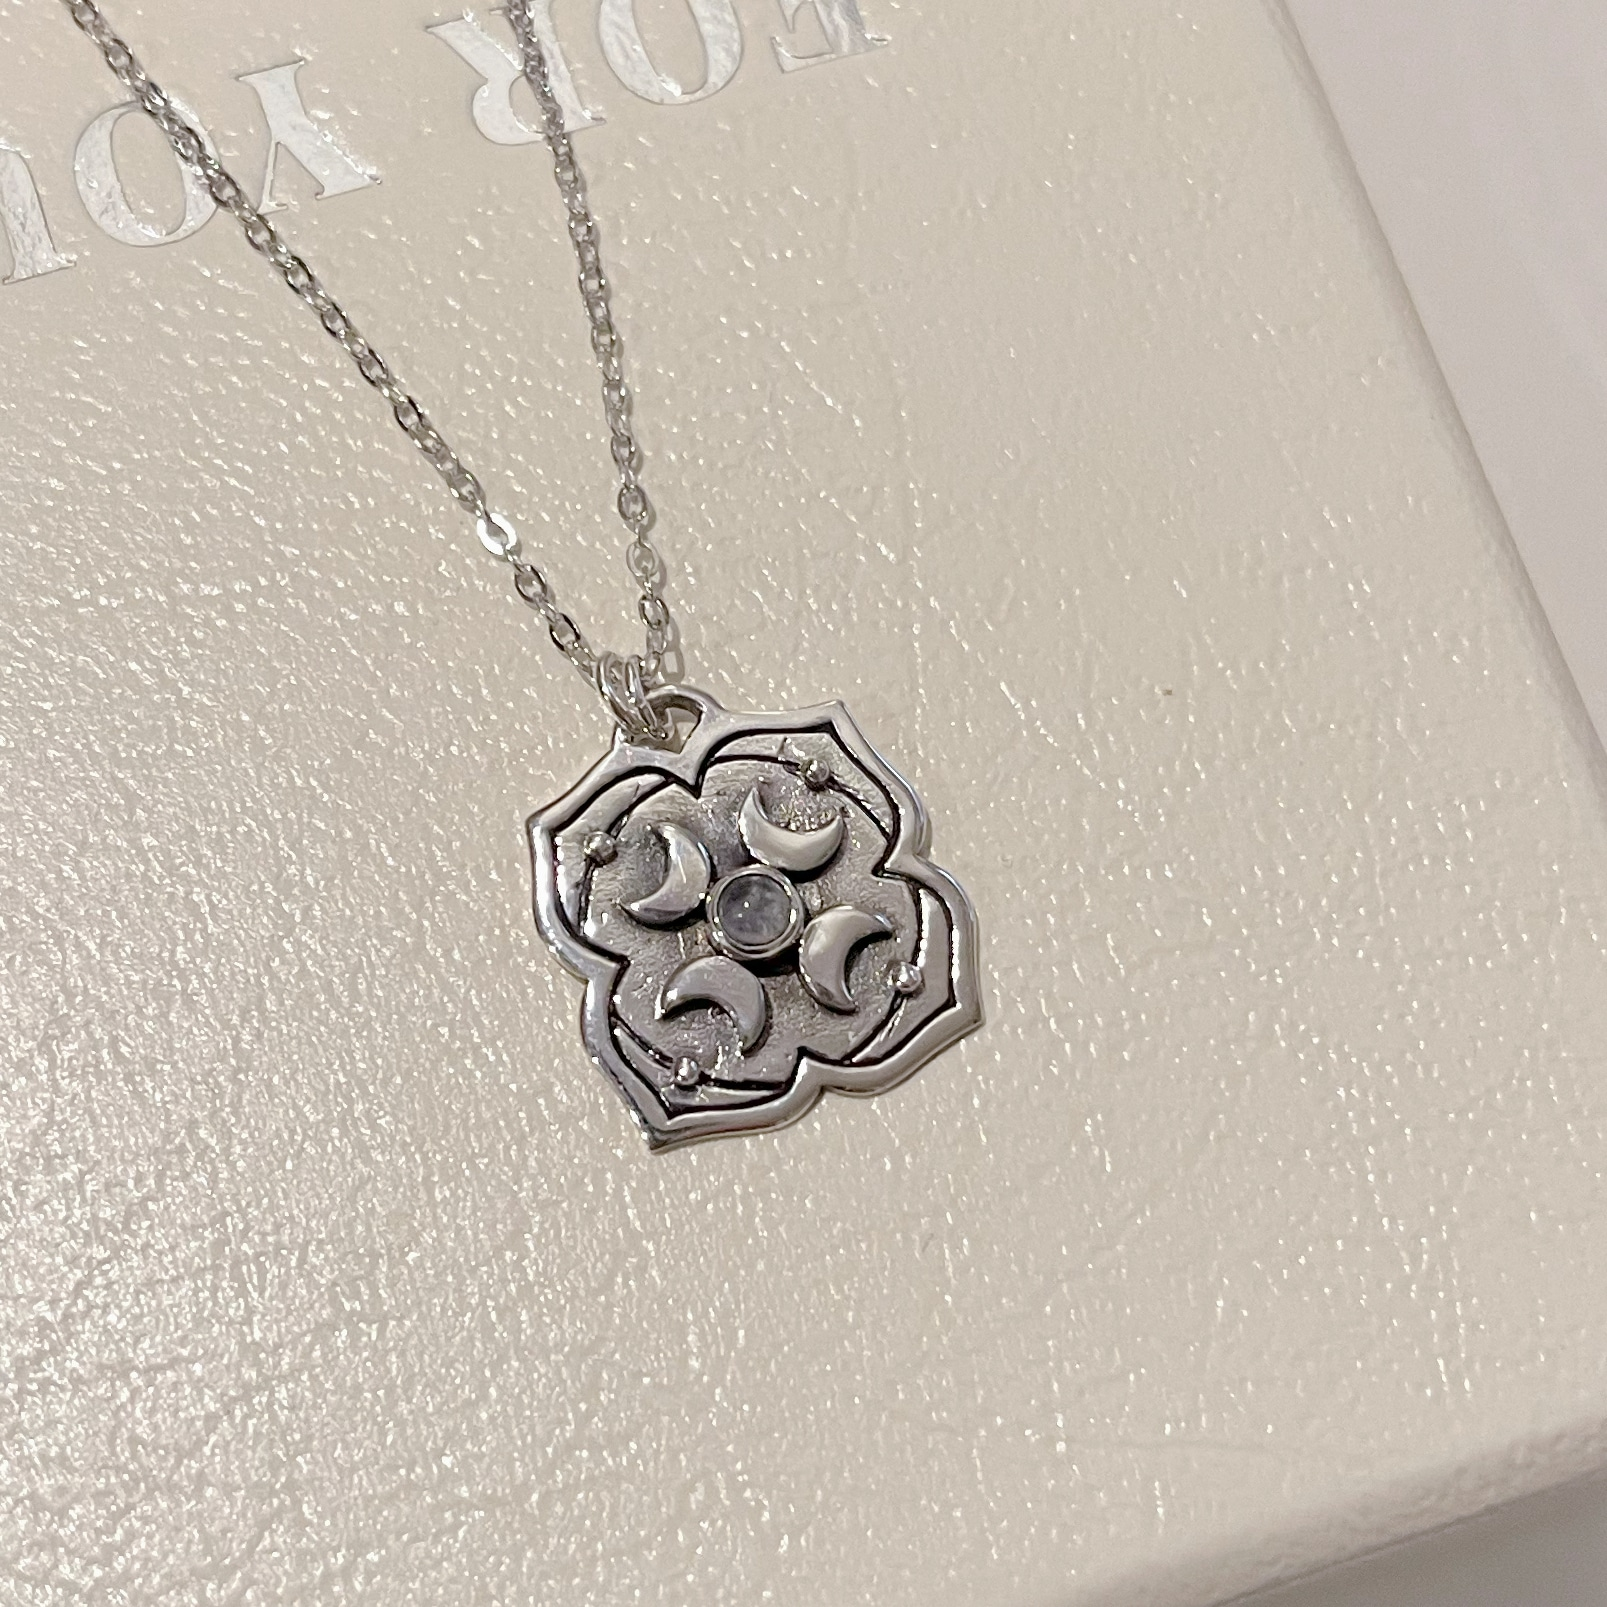 Selene Rainbow Moonstone Silver Necklace By Hidden Petals